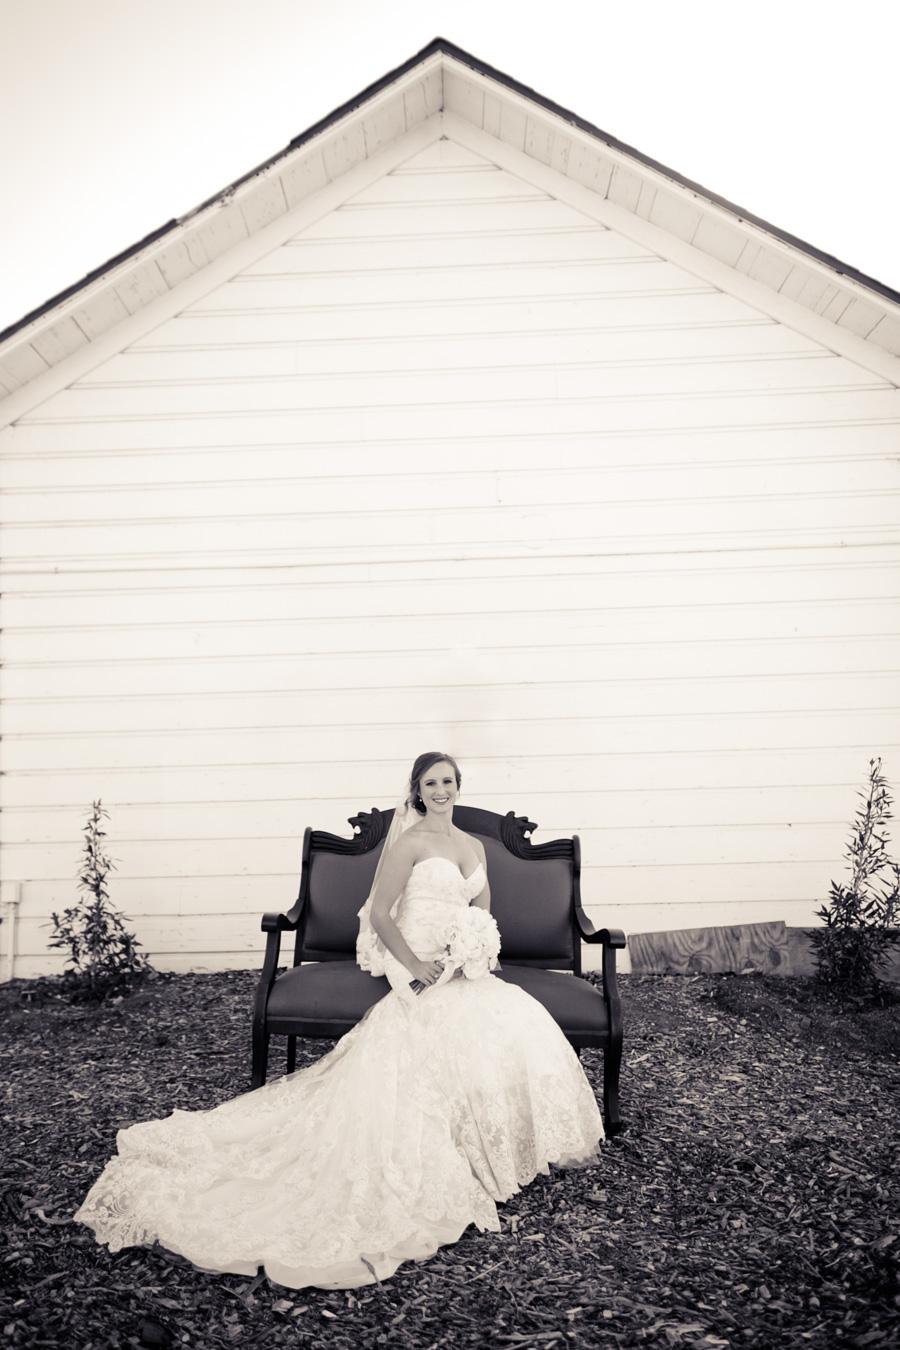 Santa Margarita Ranch Bride, Wells Fargo House